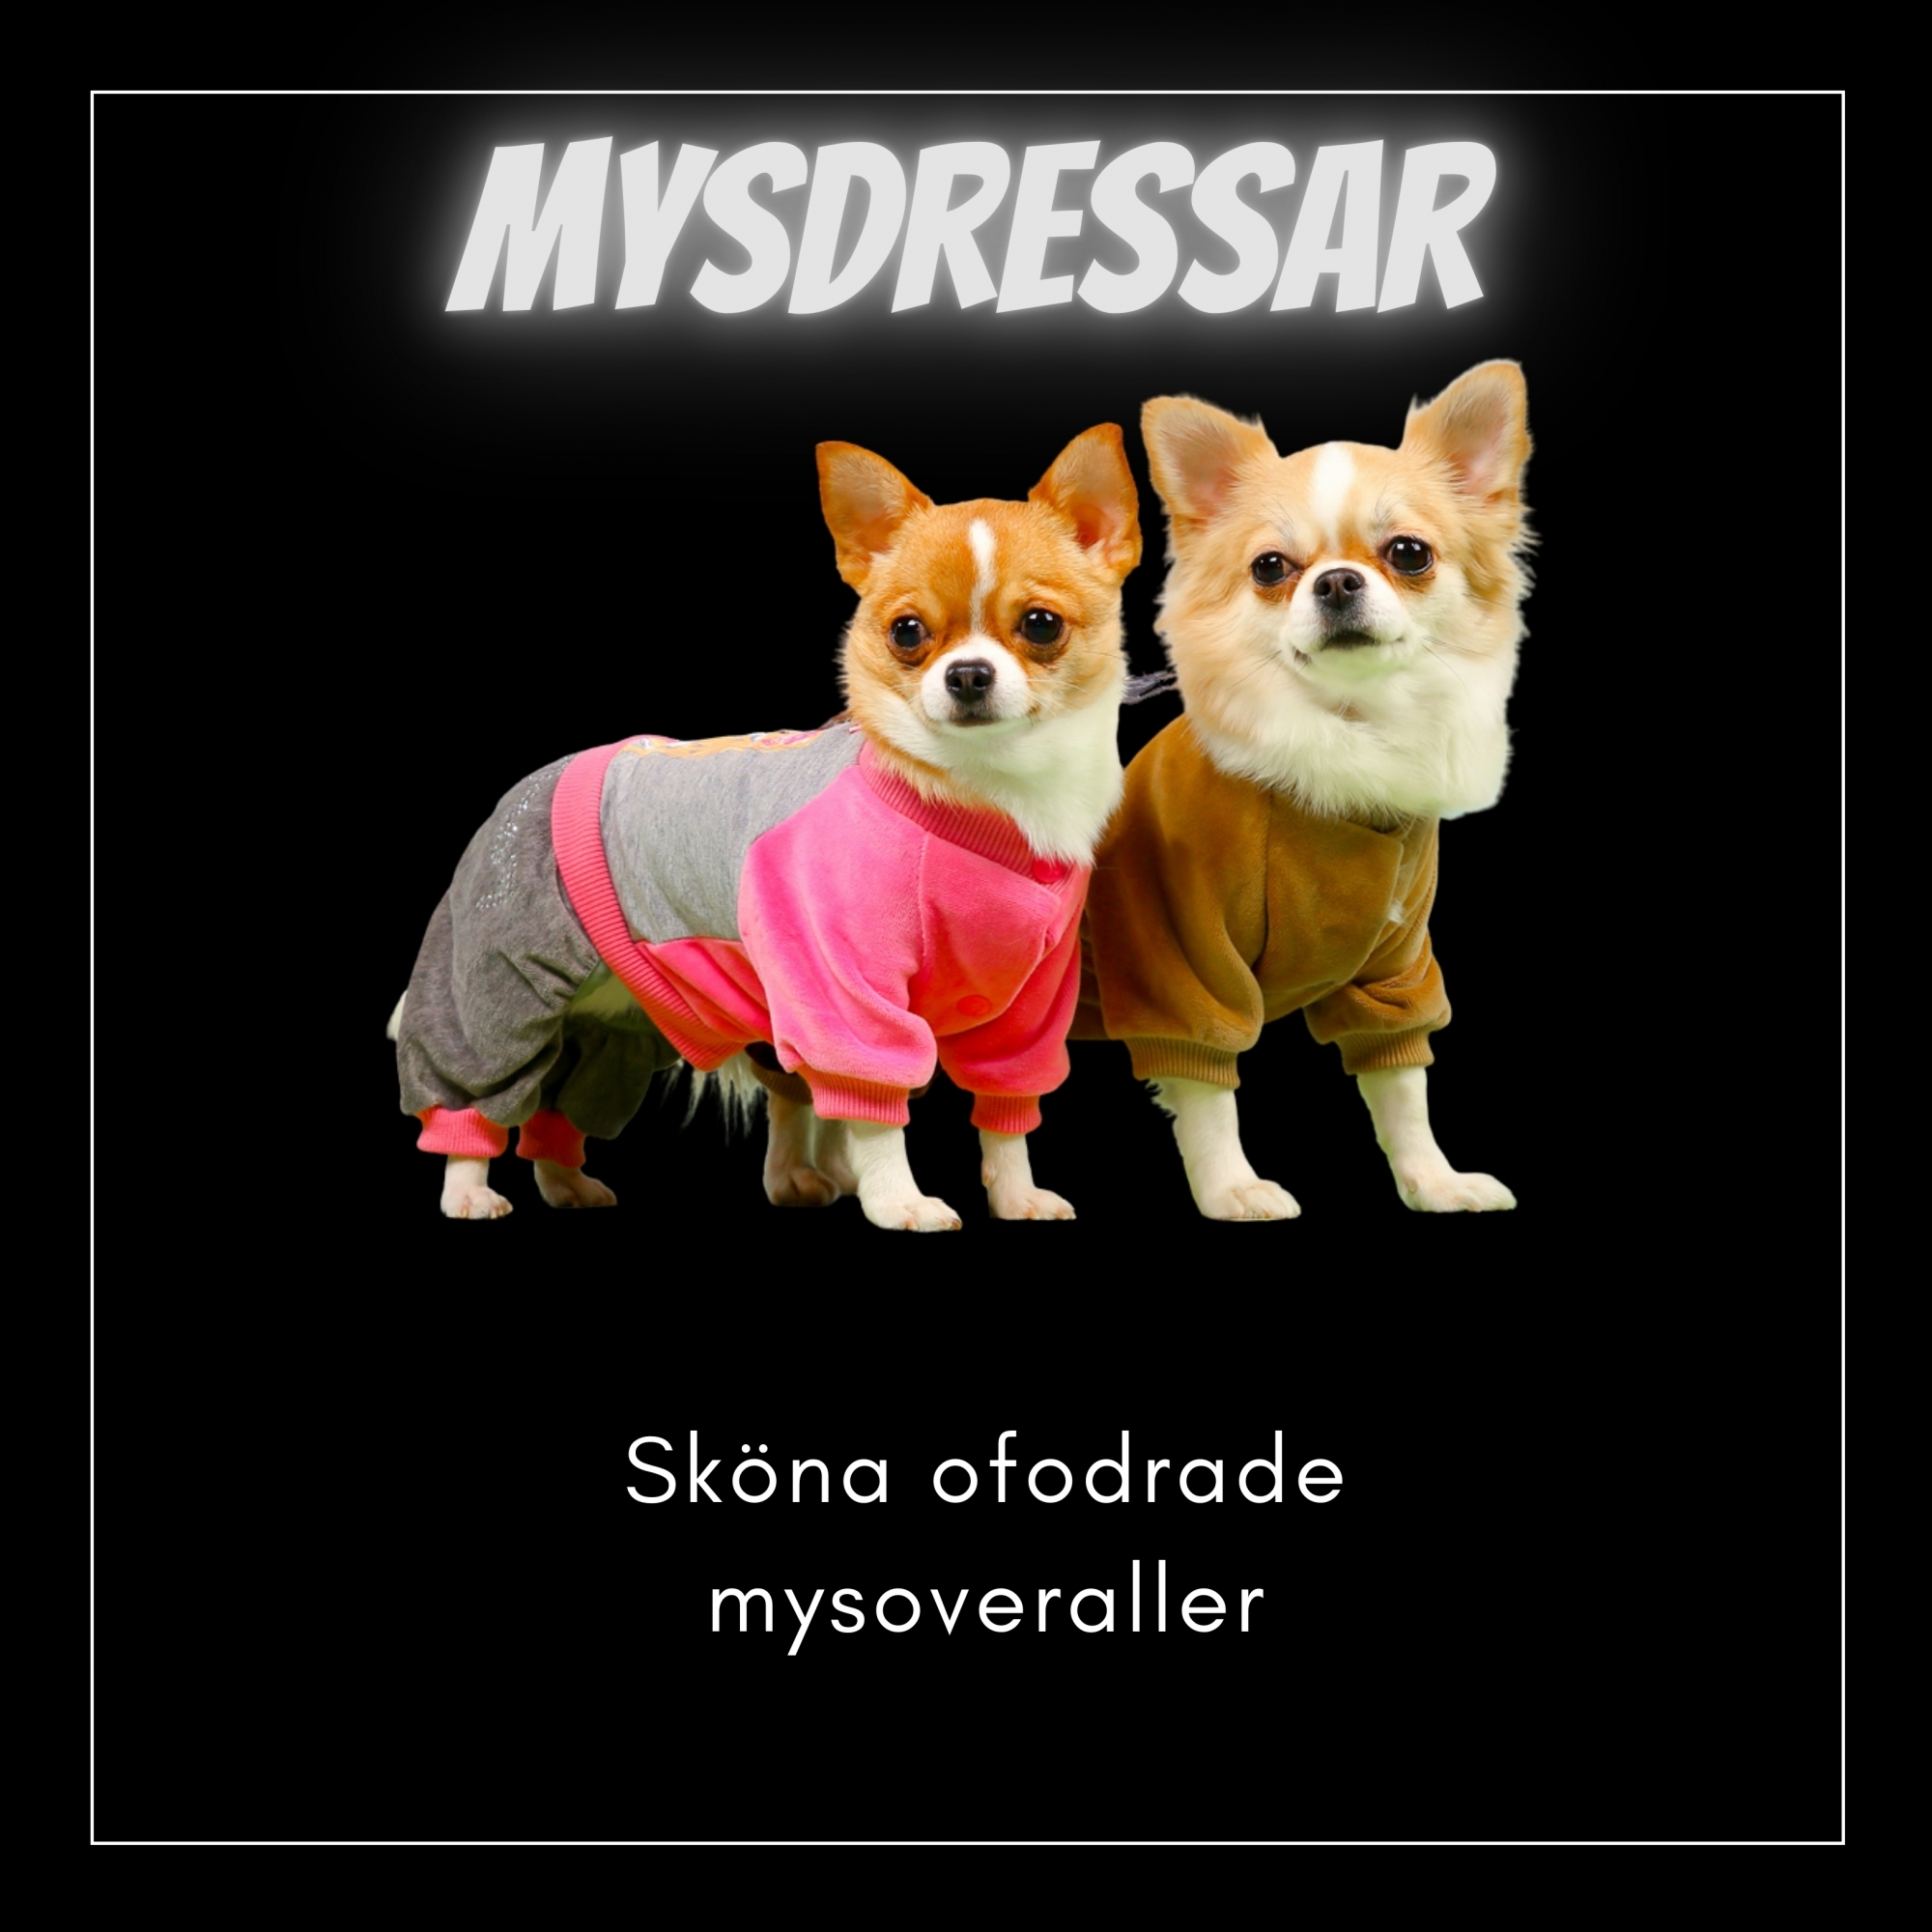 Suits & Mysoveraller - Små hundar - Passion For Pet Fashion